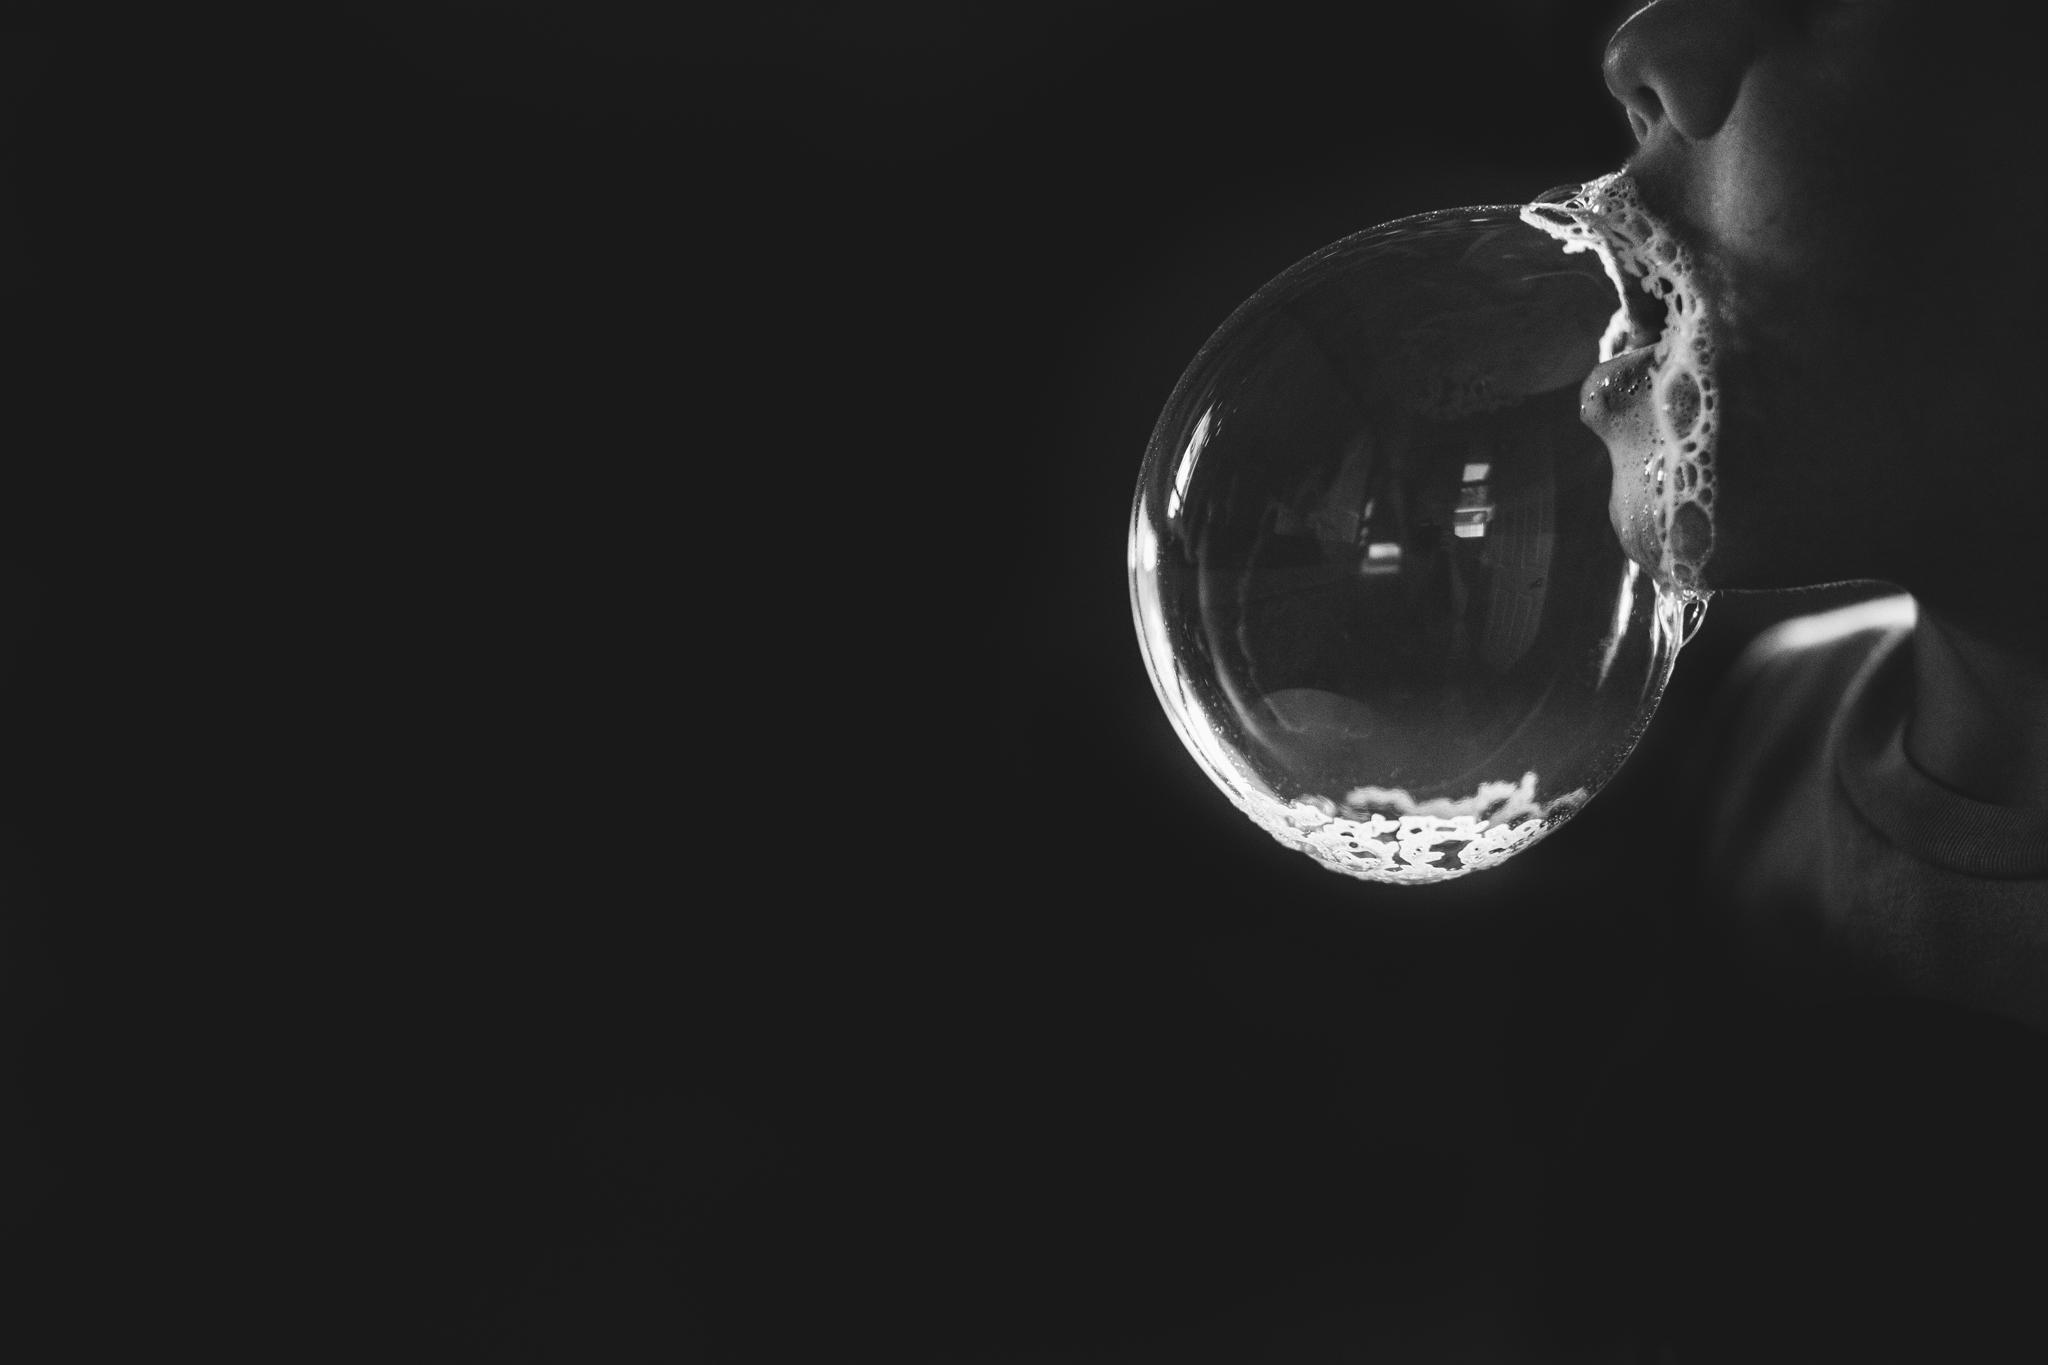 Atticus toothpaste bubble-1.jpg